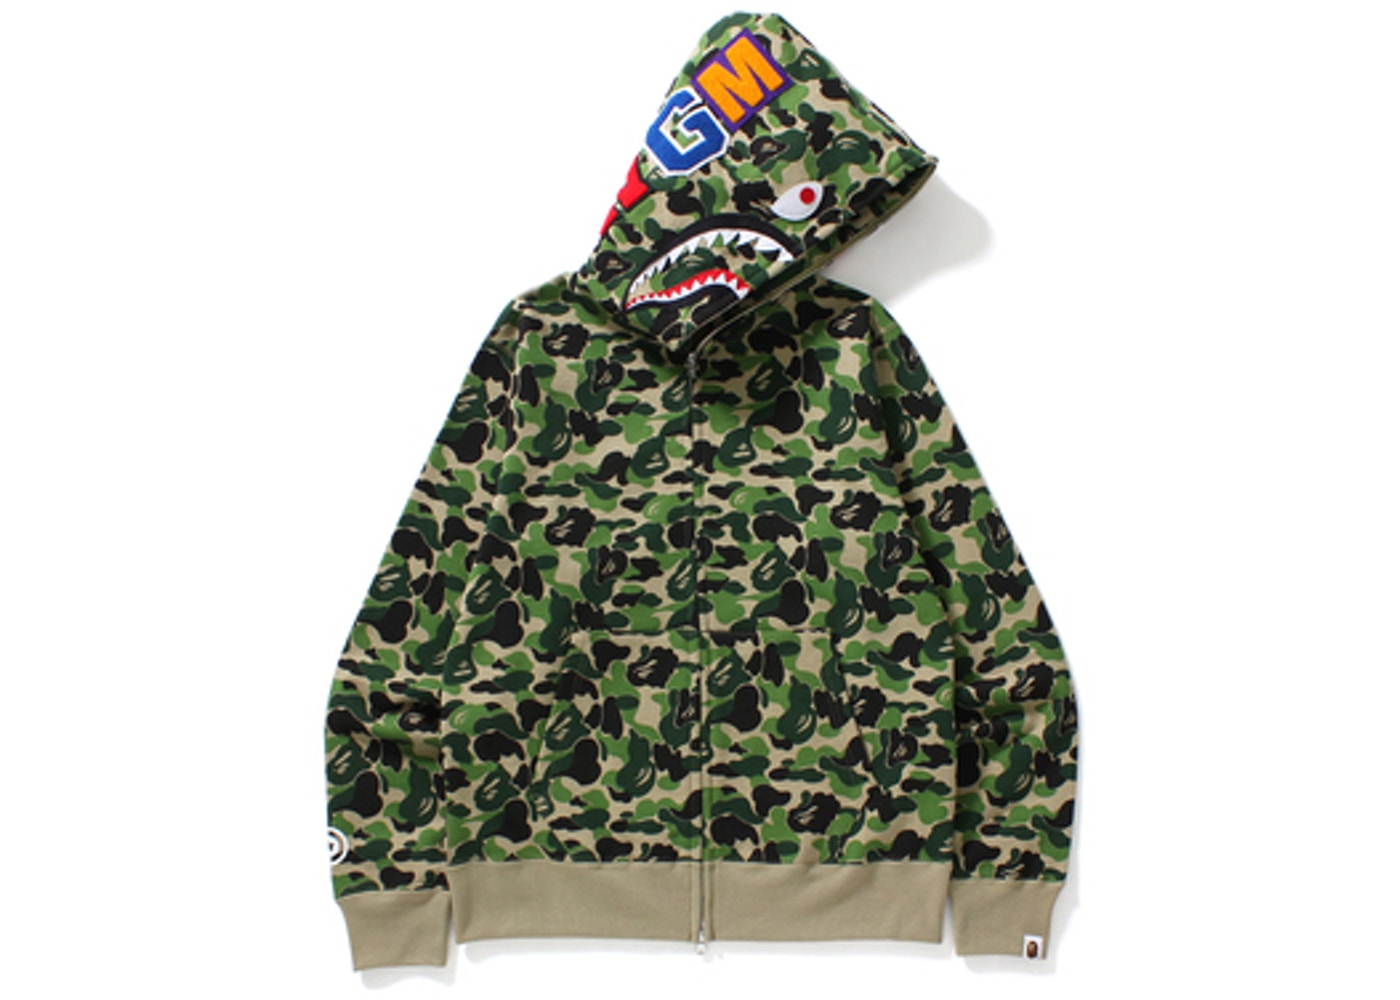 8549d548ec94 Streetwear - Bape Tops Sweatshirts - New Highest Bids